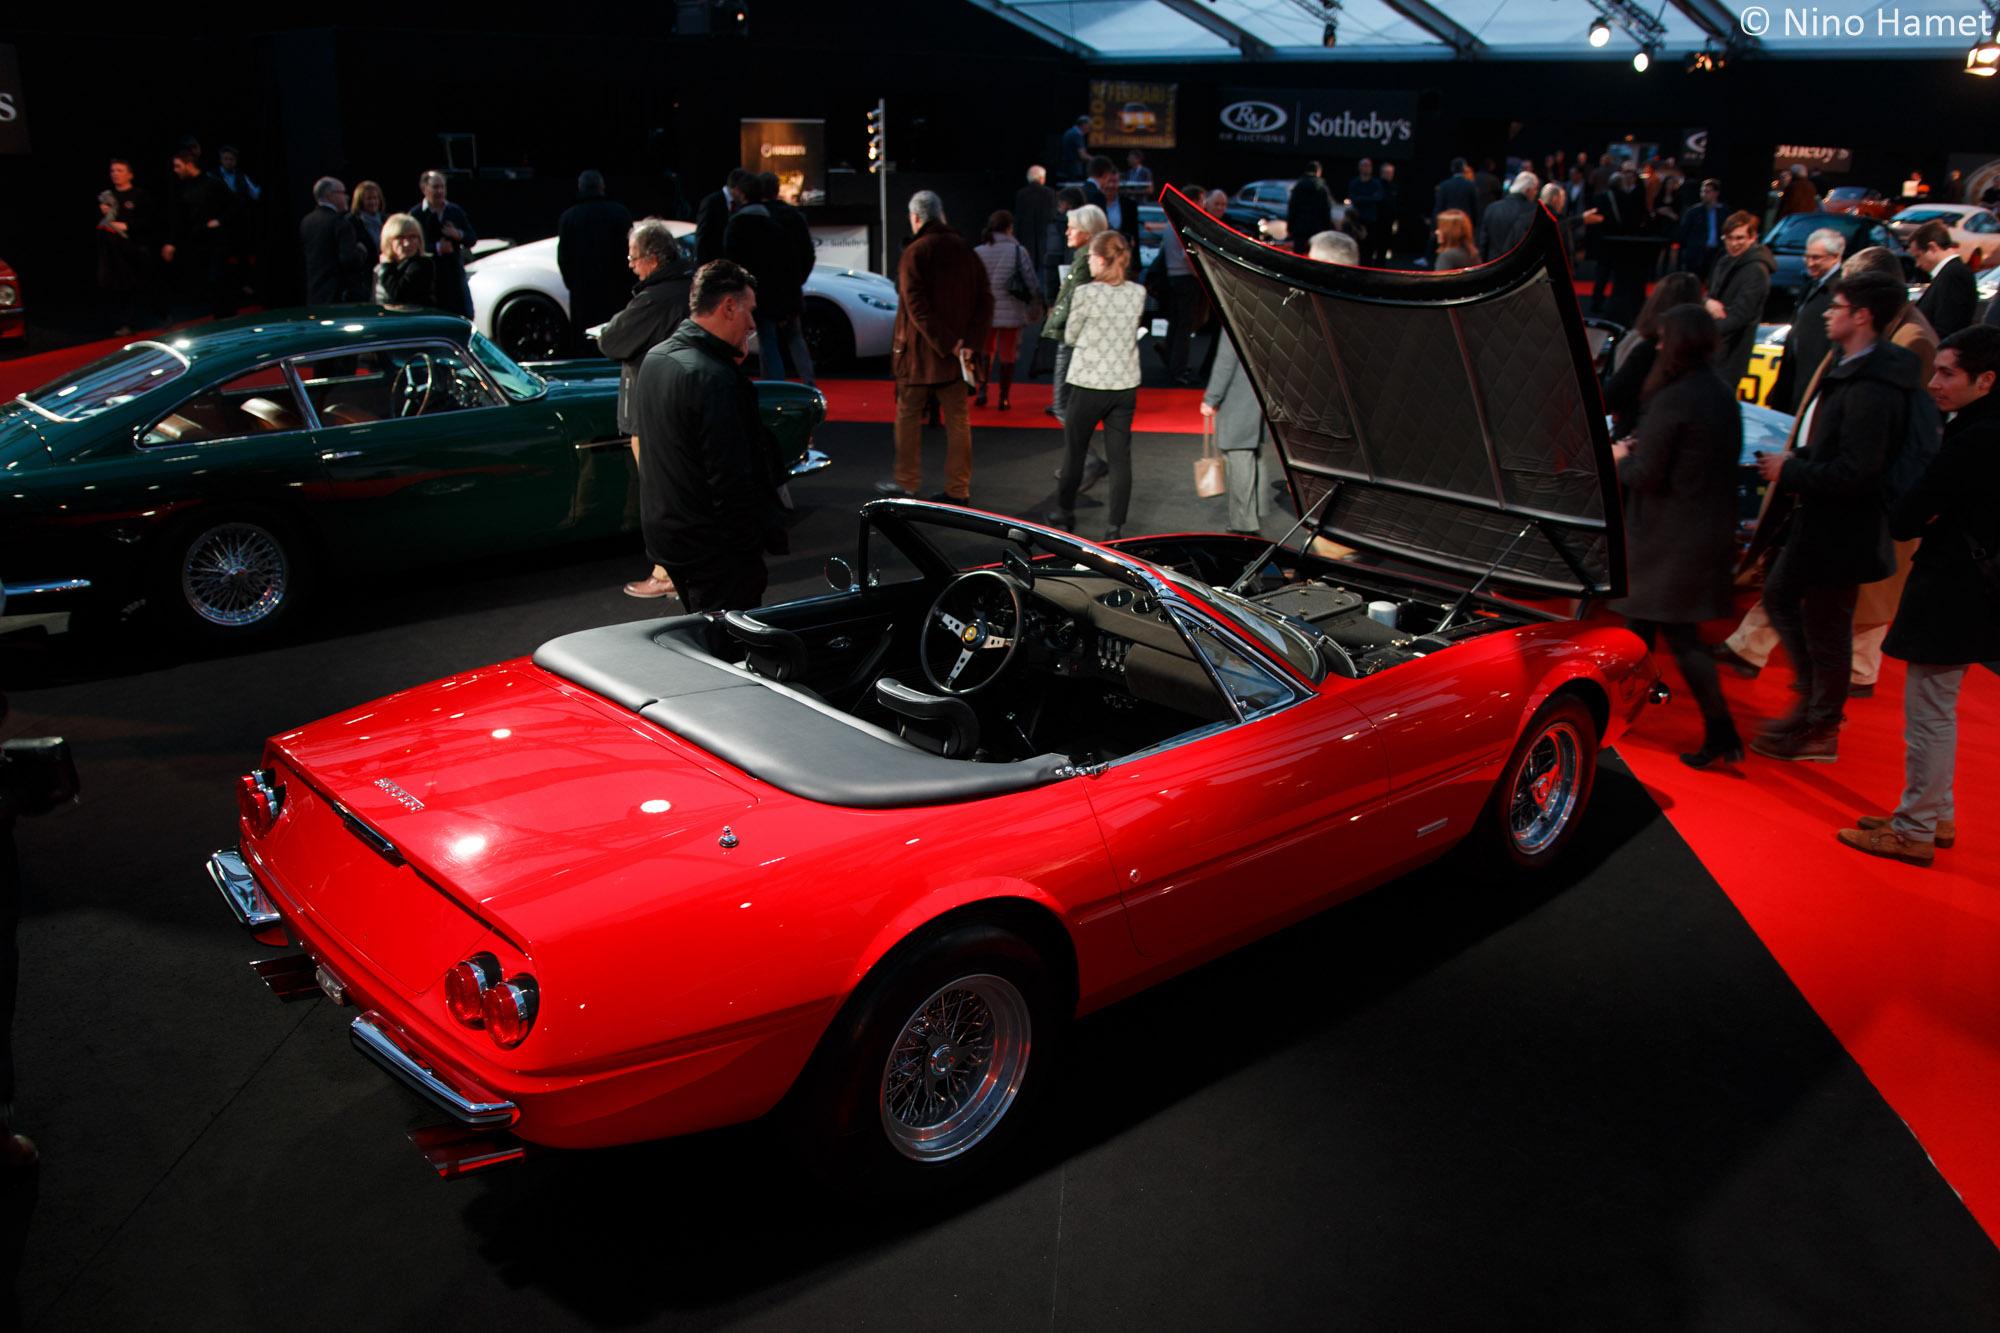 Ferrari 365 GTB/4 Daytona Spyder, 1 925 000 euros au marteau.